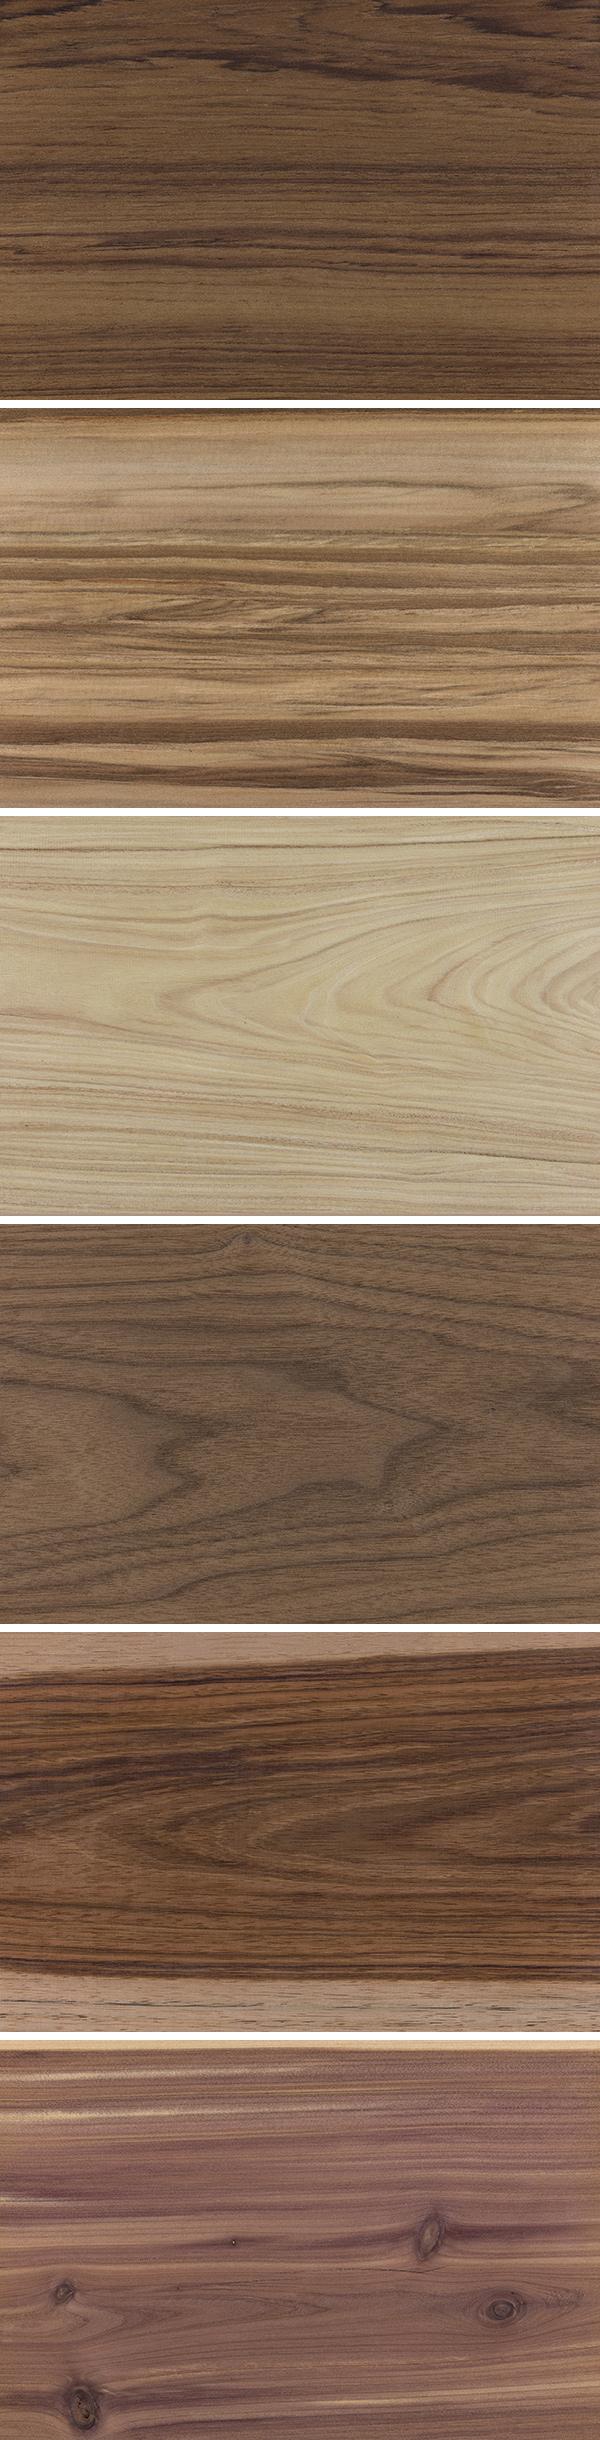 6-Fine-Wood-Textures-Vol3-600